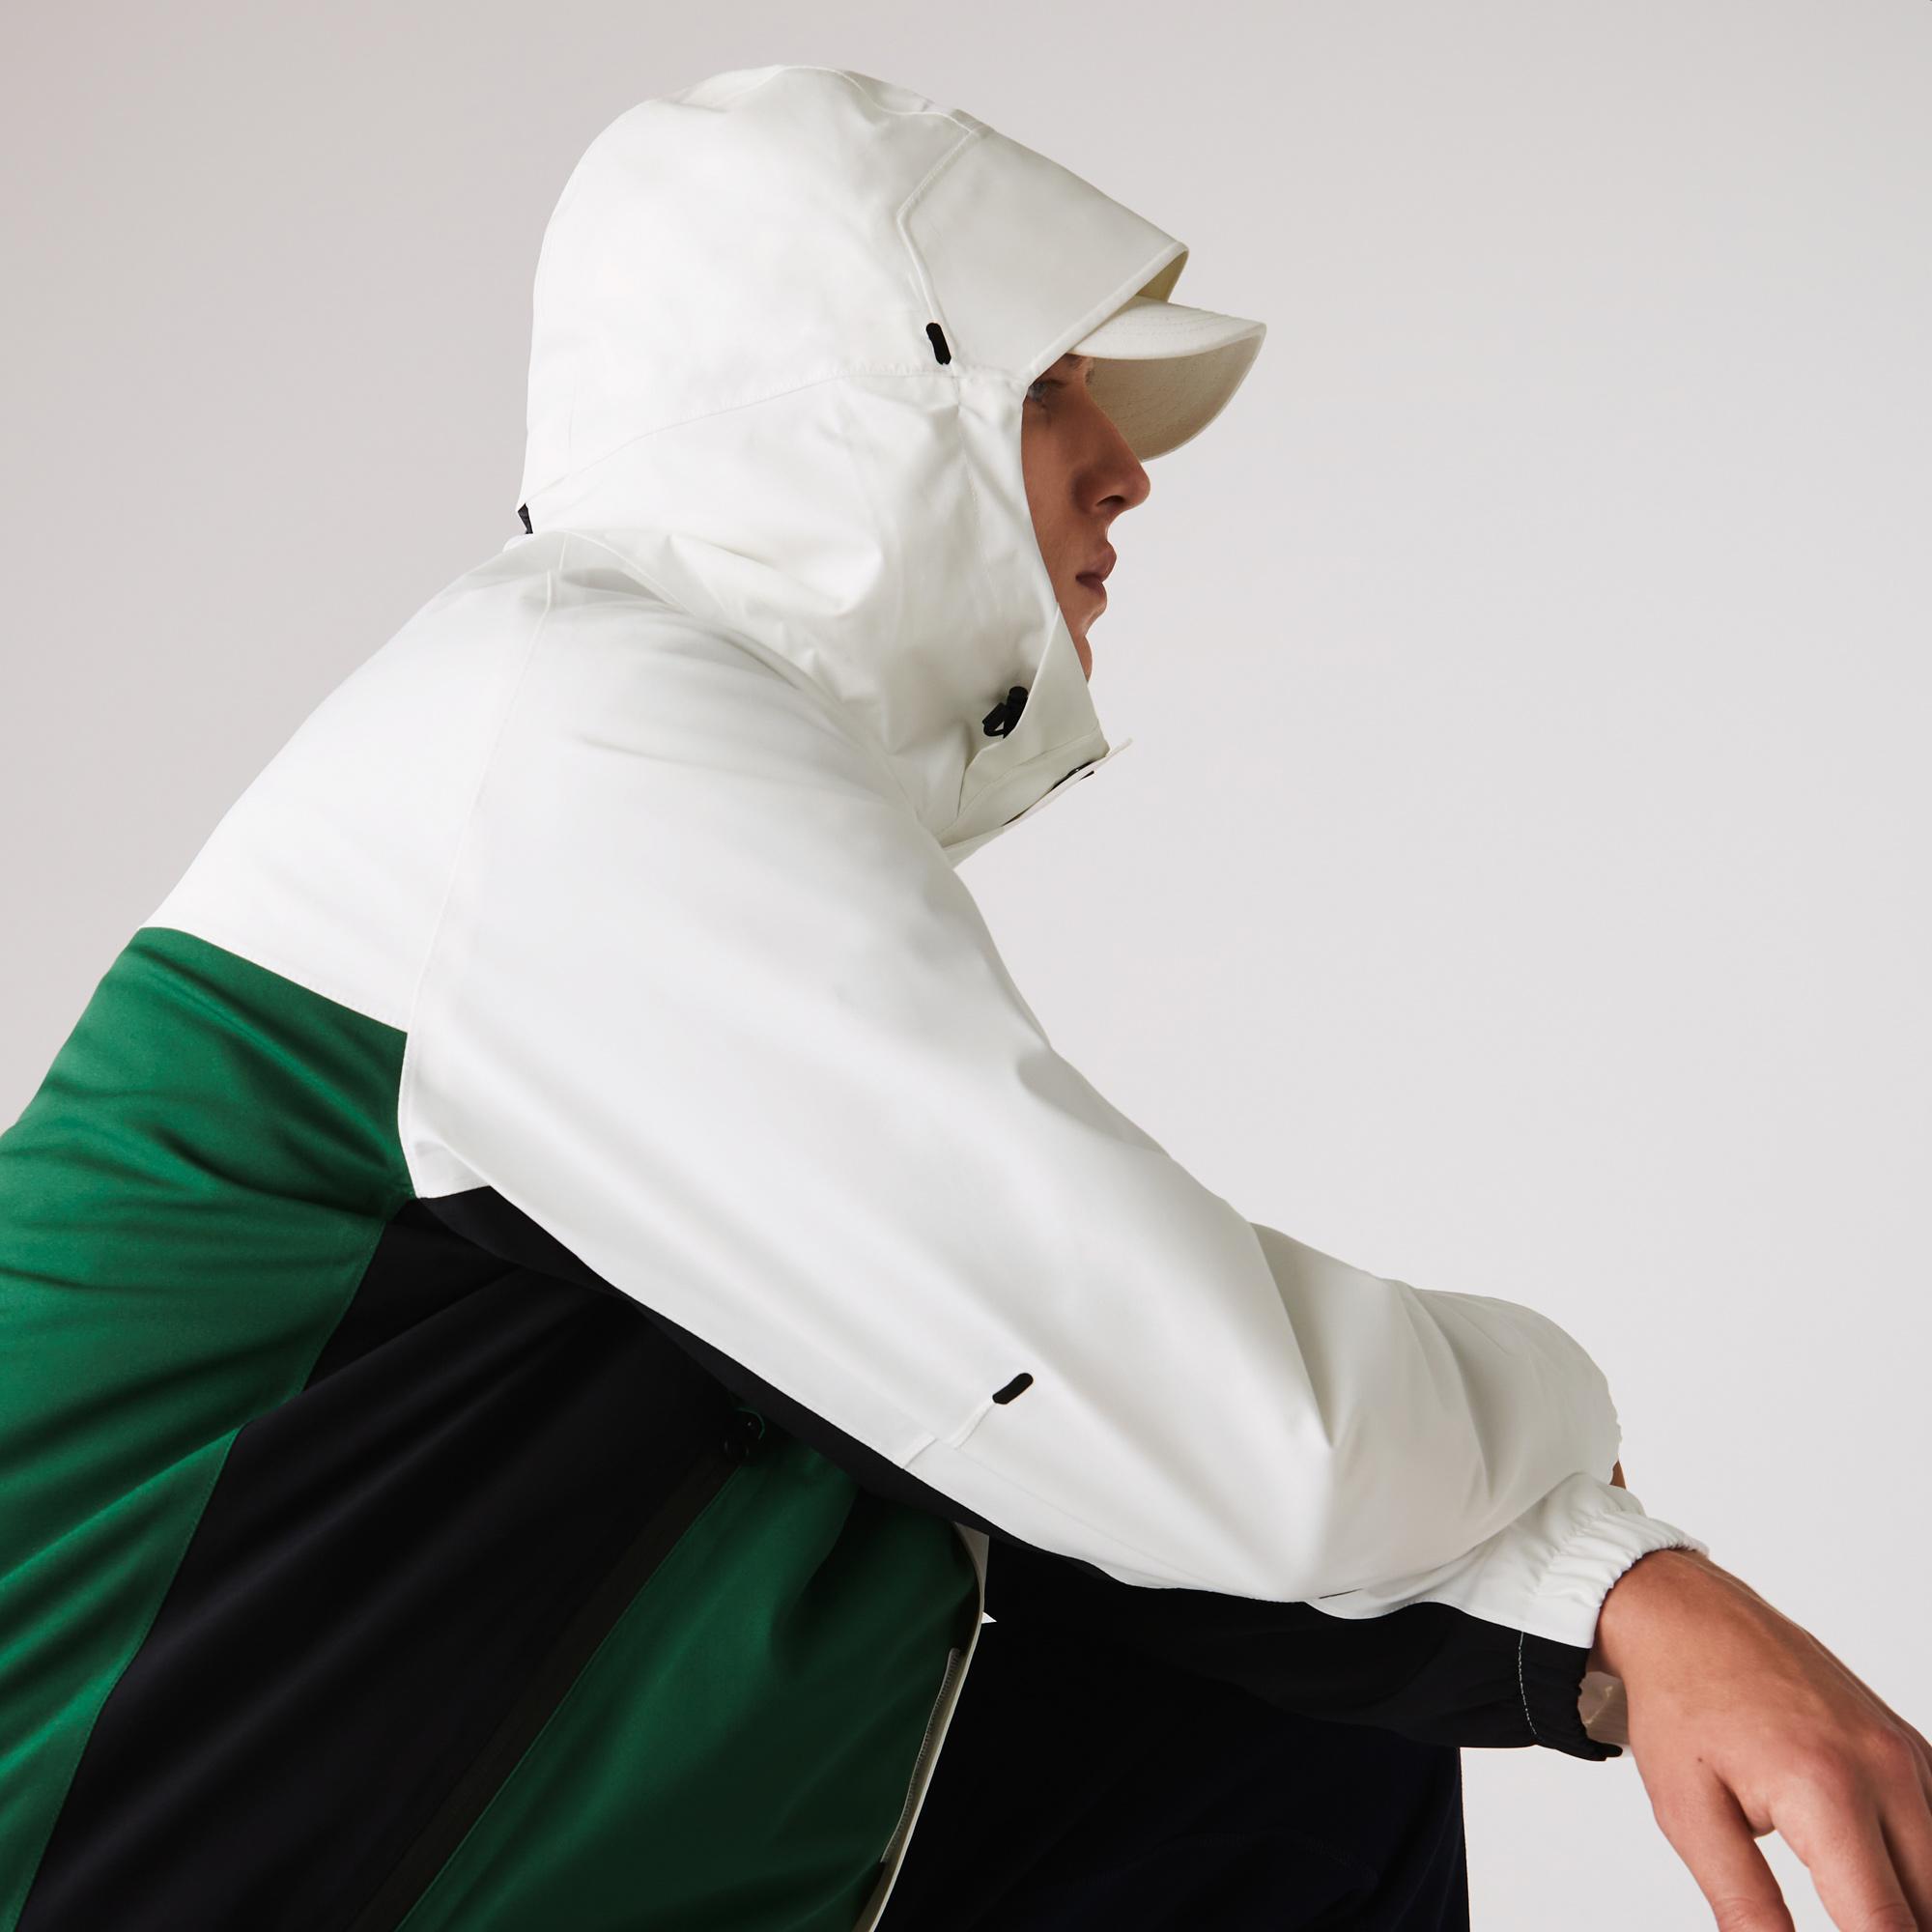 Lacoste Men's Lightweight Colorblock Hooded Water-Resistant Jacket